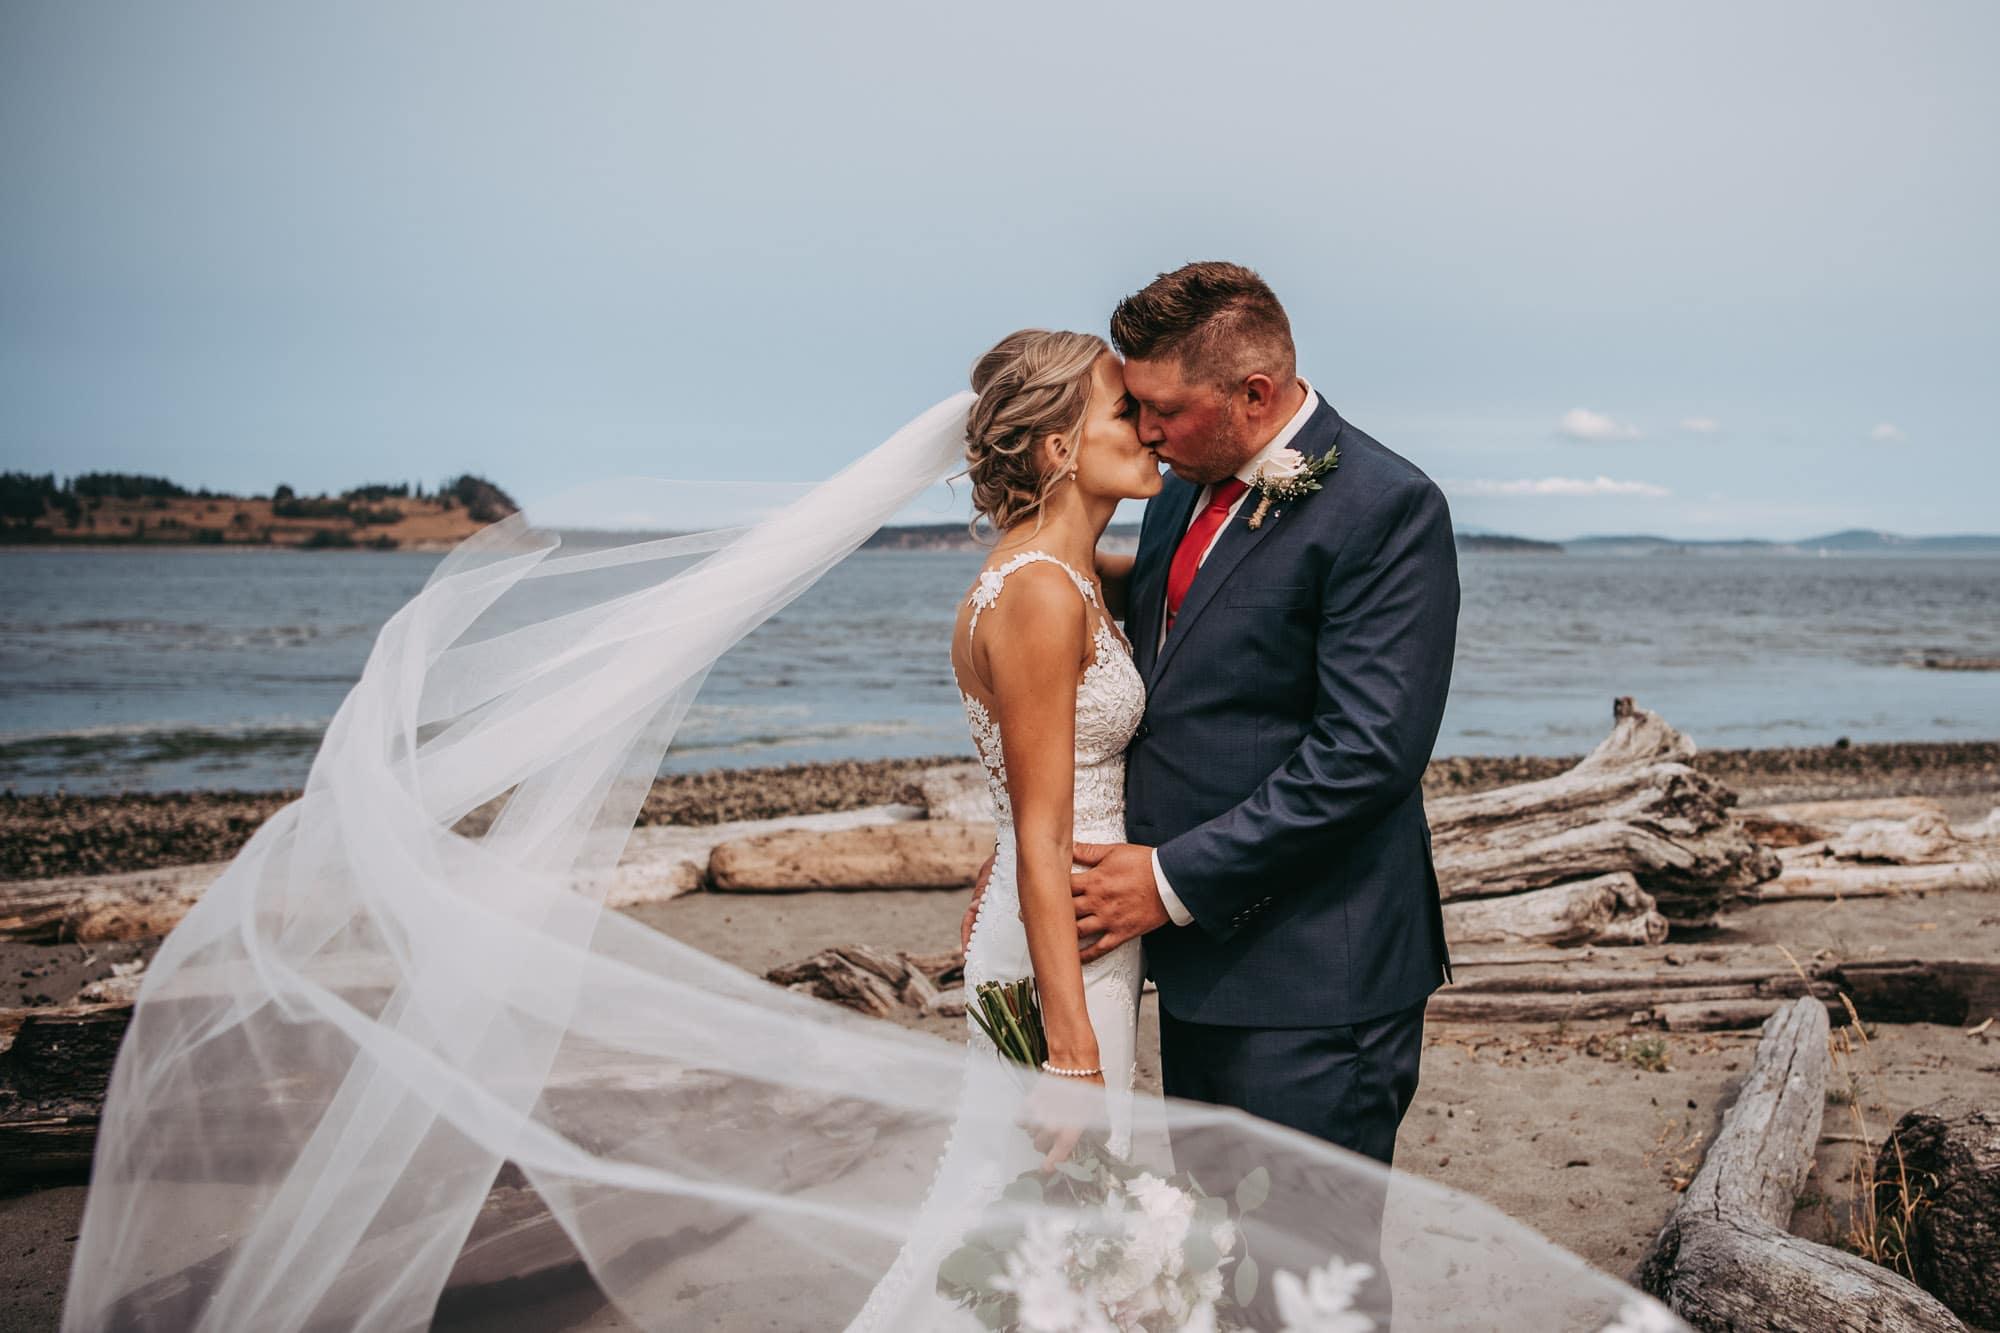 Island View Beach wedding